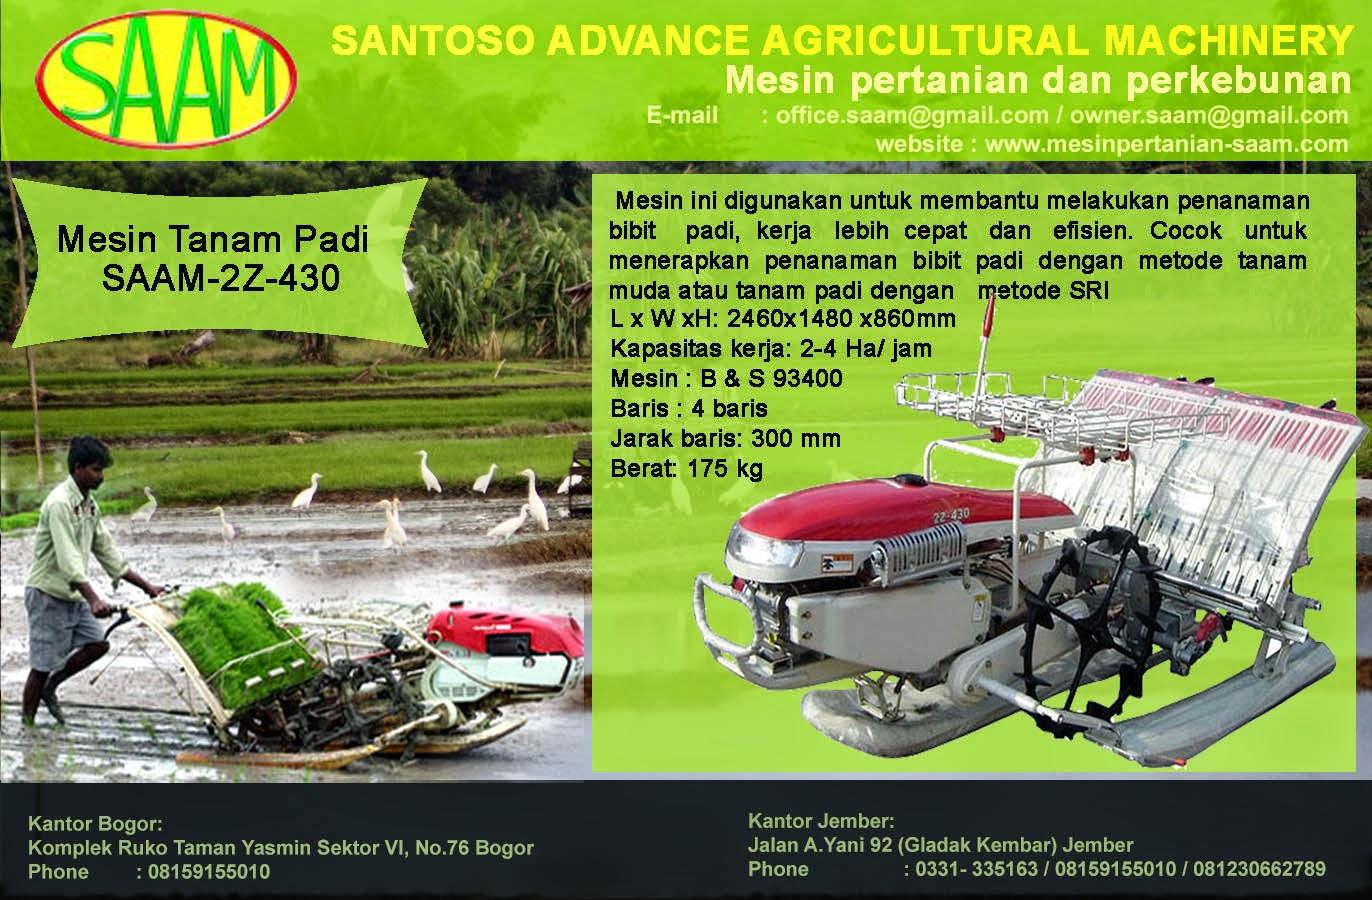 Mesin Tanam Padi Santoso Advance Agricultural Machinery Paket Tudung 1 Pisau Dan Gearcase